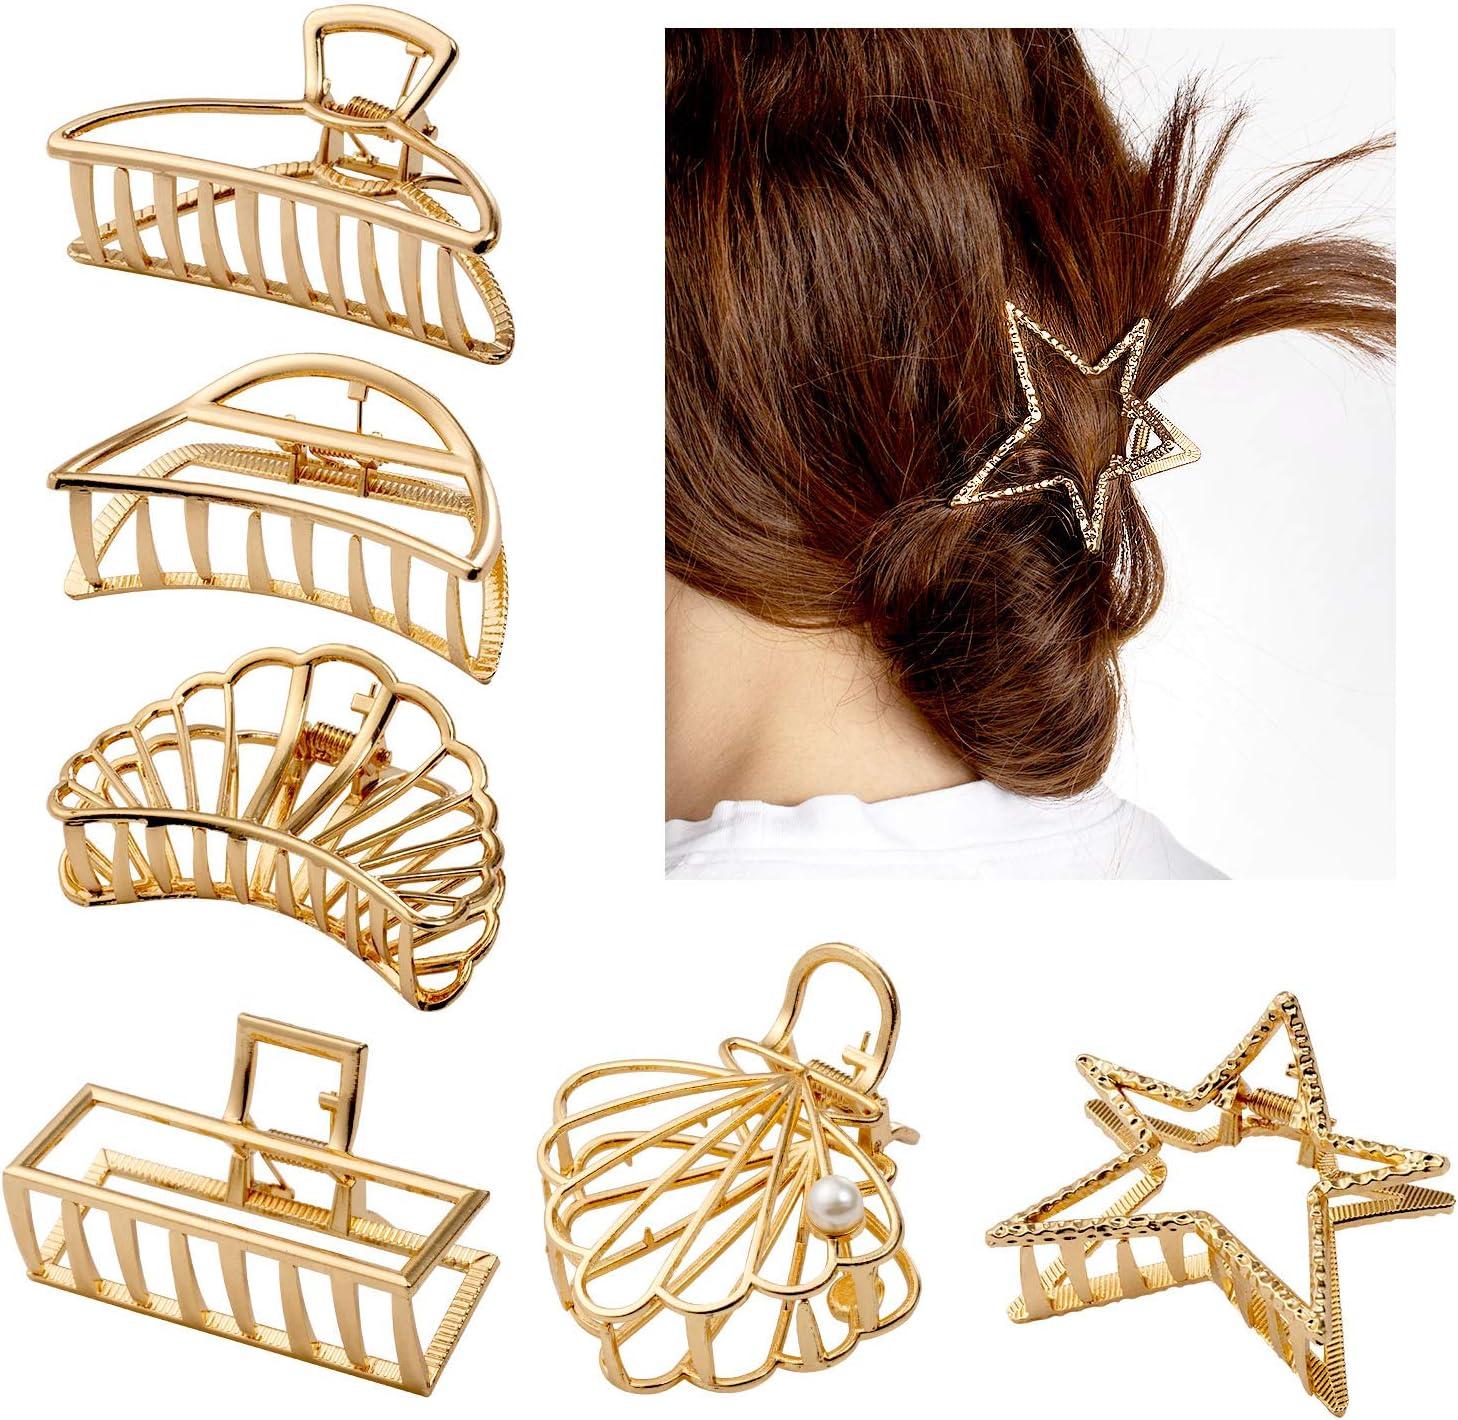 Comius Sharp 6pcs Clips de Pelo de Garra de Metal, Grandes Antideslizantes para Mujeres Niñas Hebillas de Pelo para Sujetar Pelo